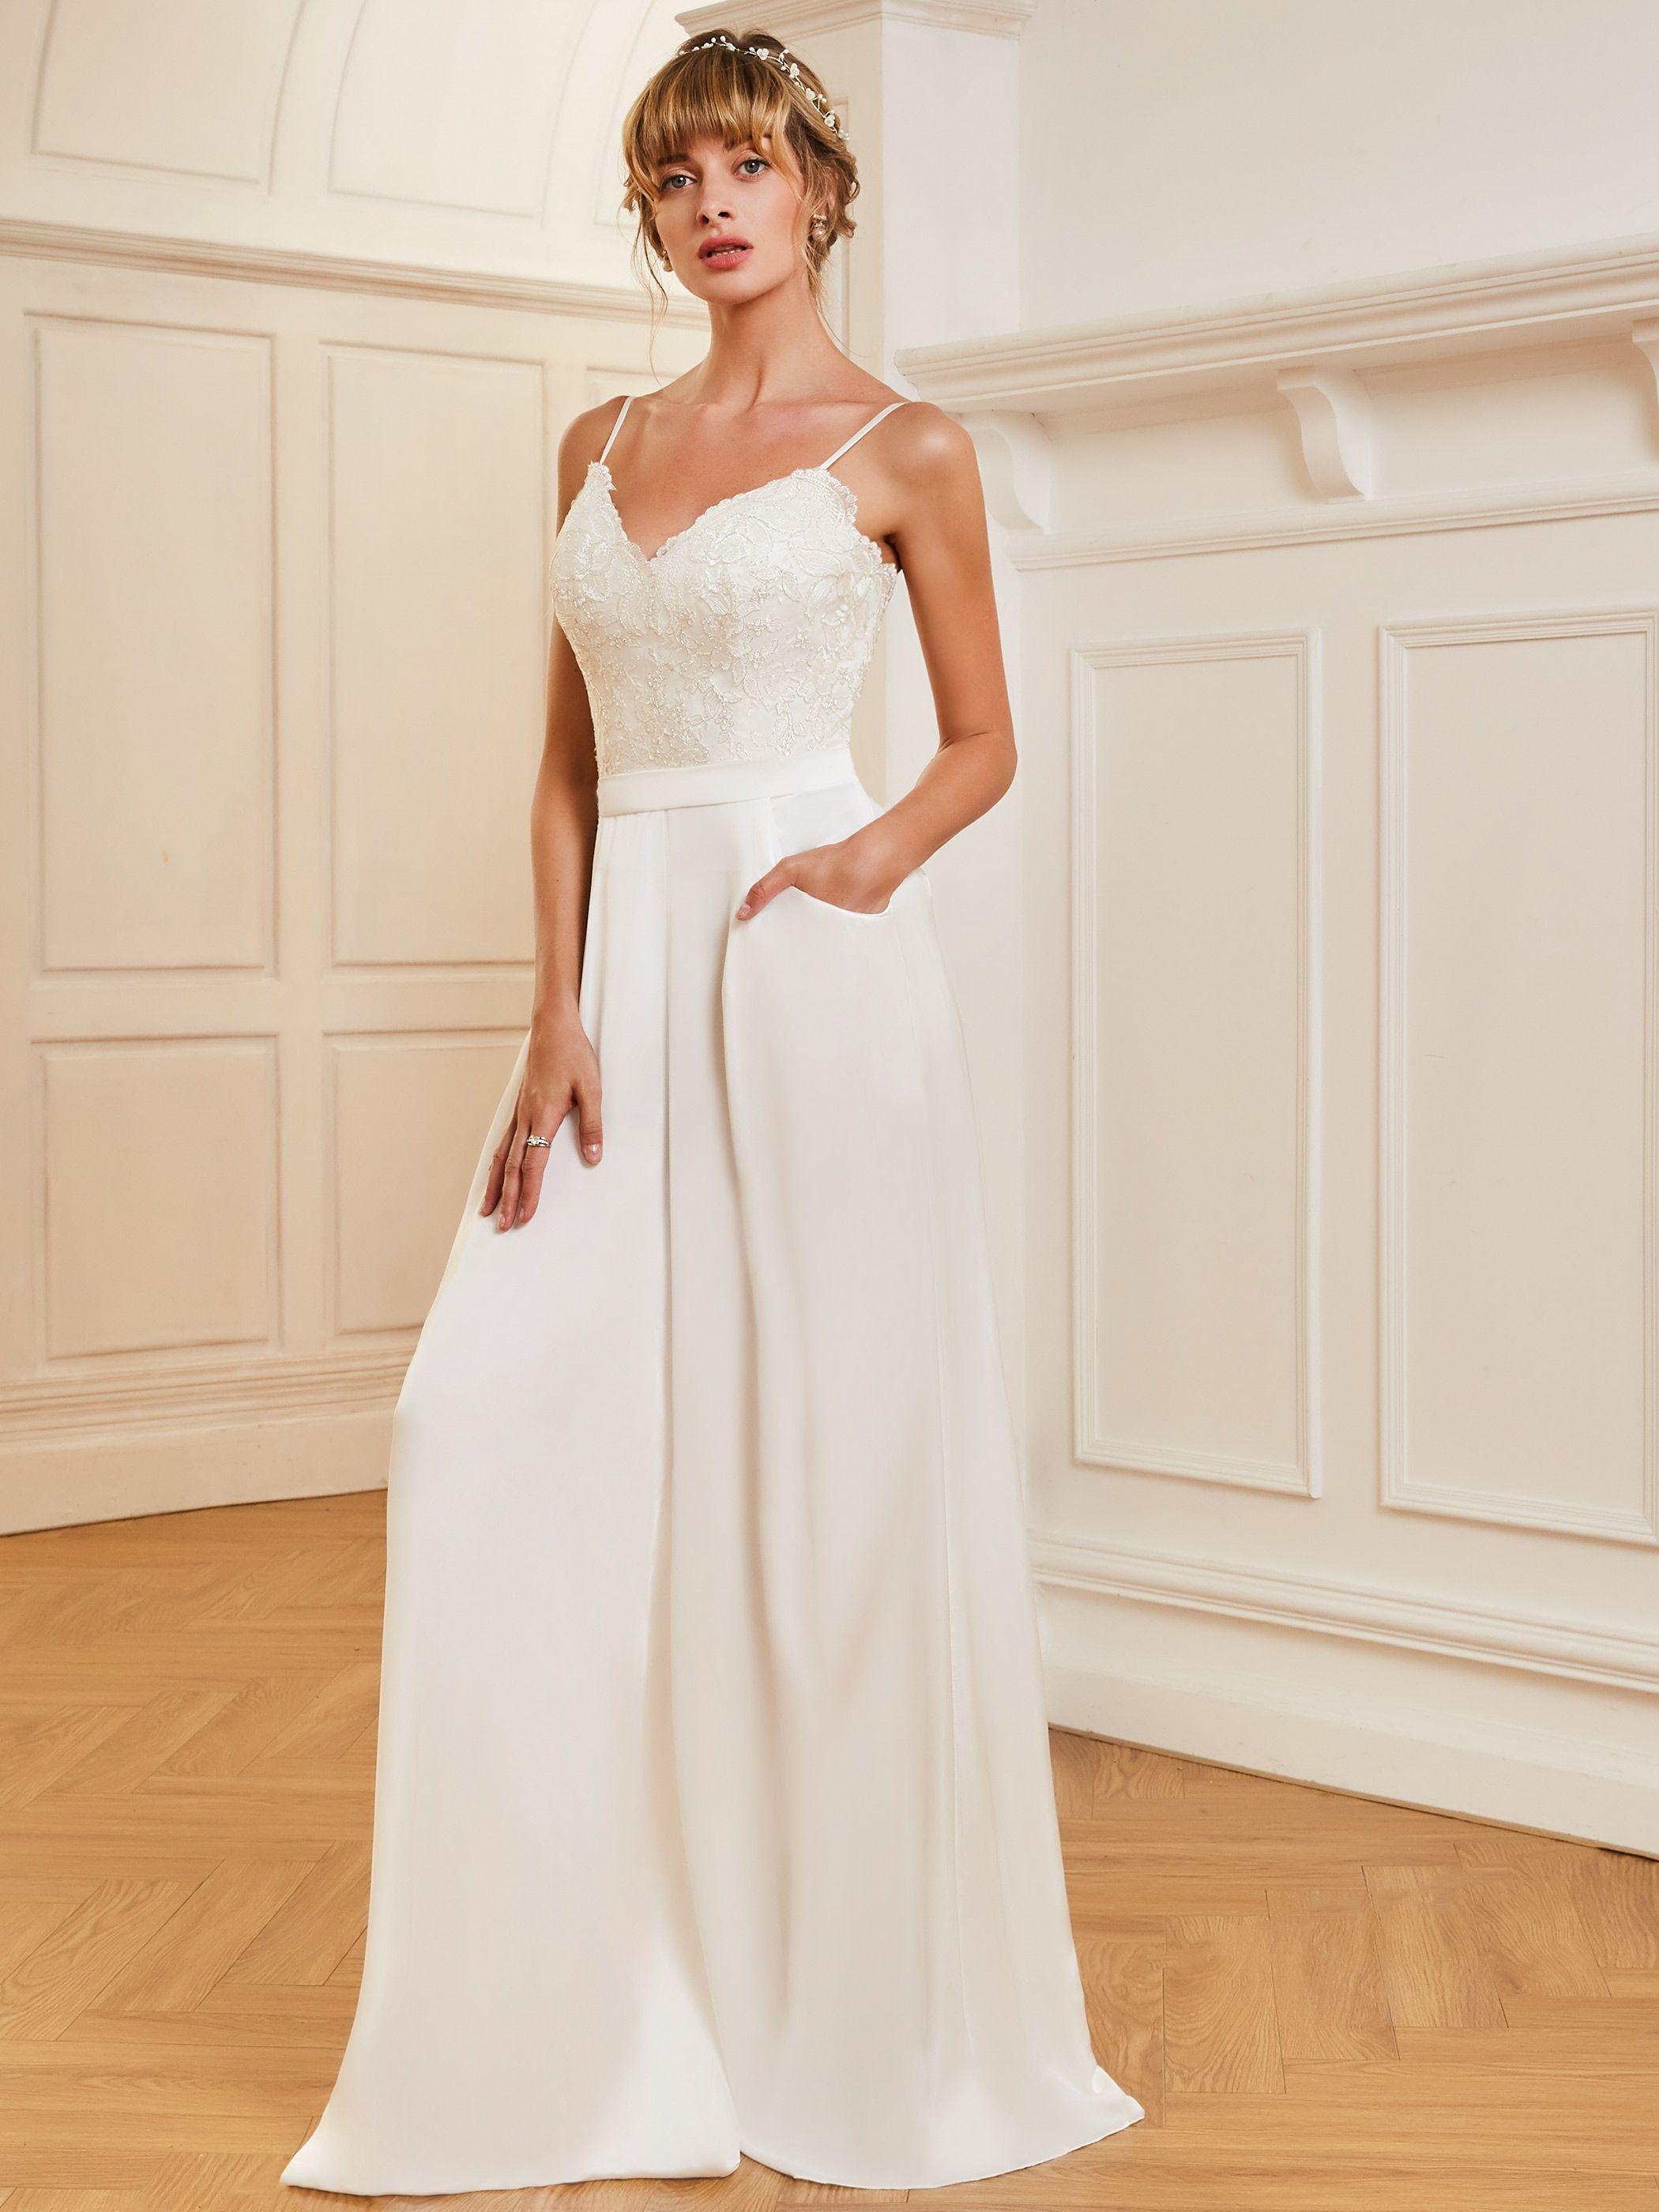 Spaghetti Straps Appliques Wedding Jumpsuit Bridal gown